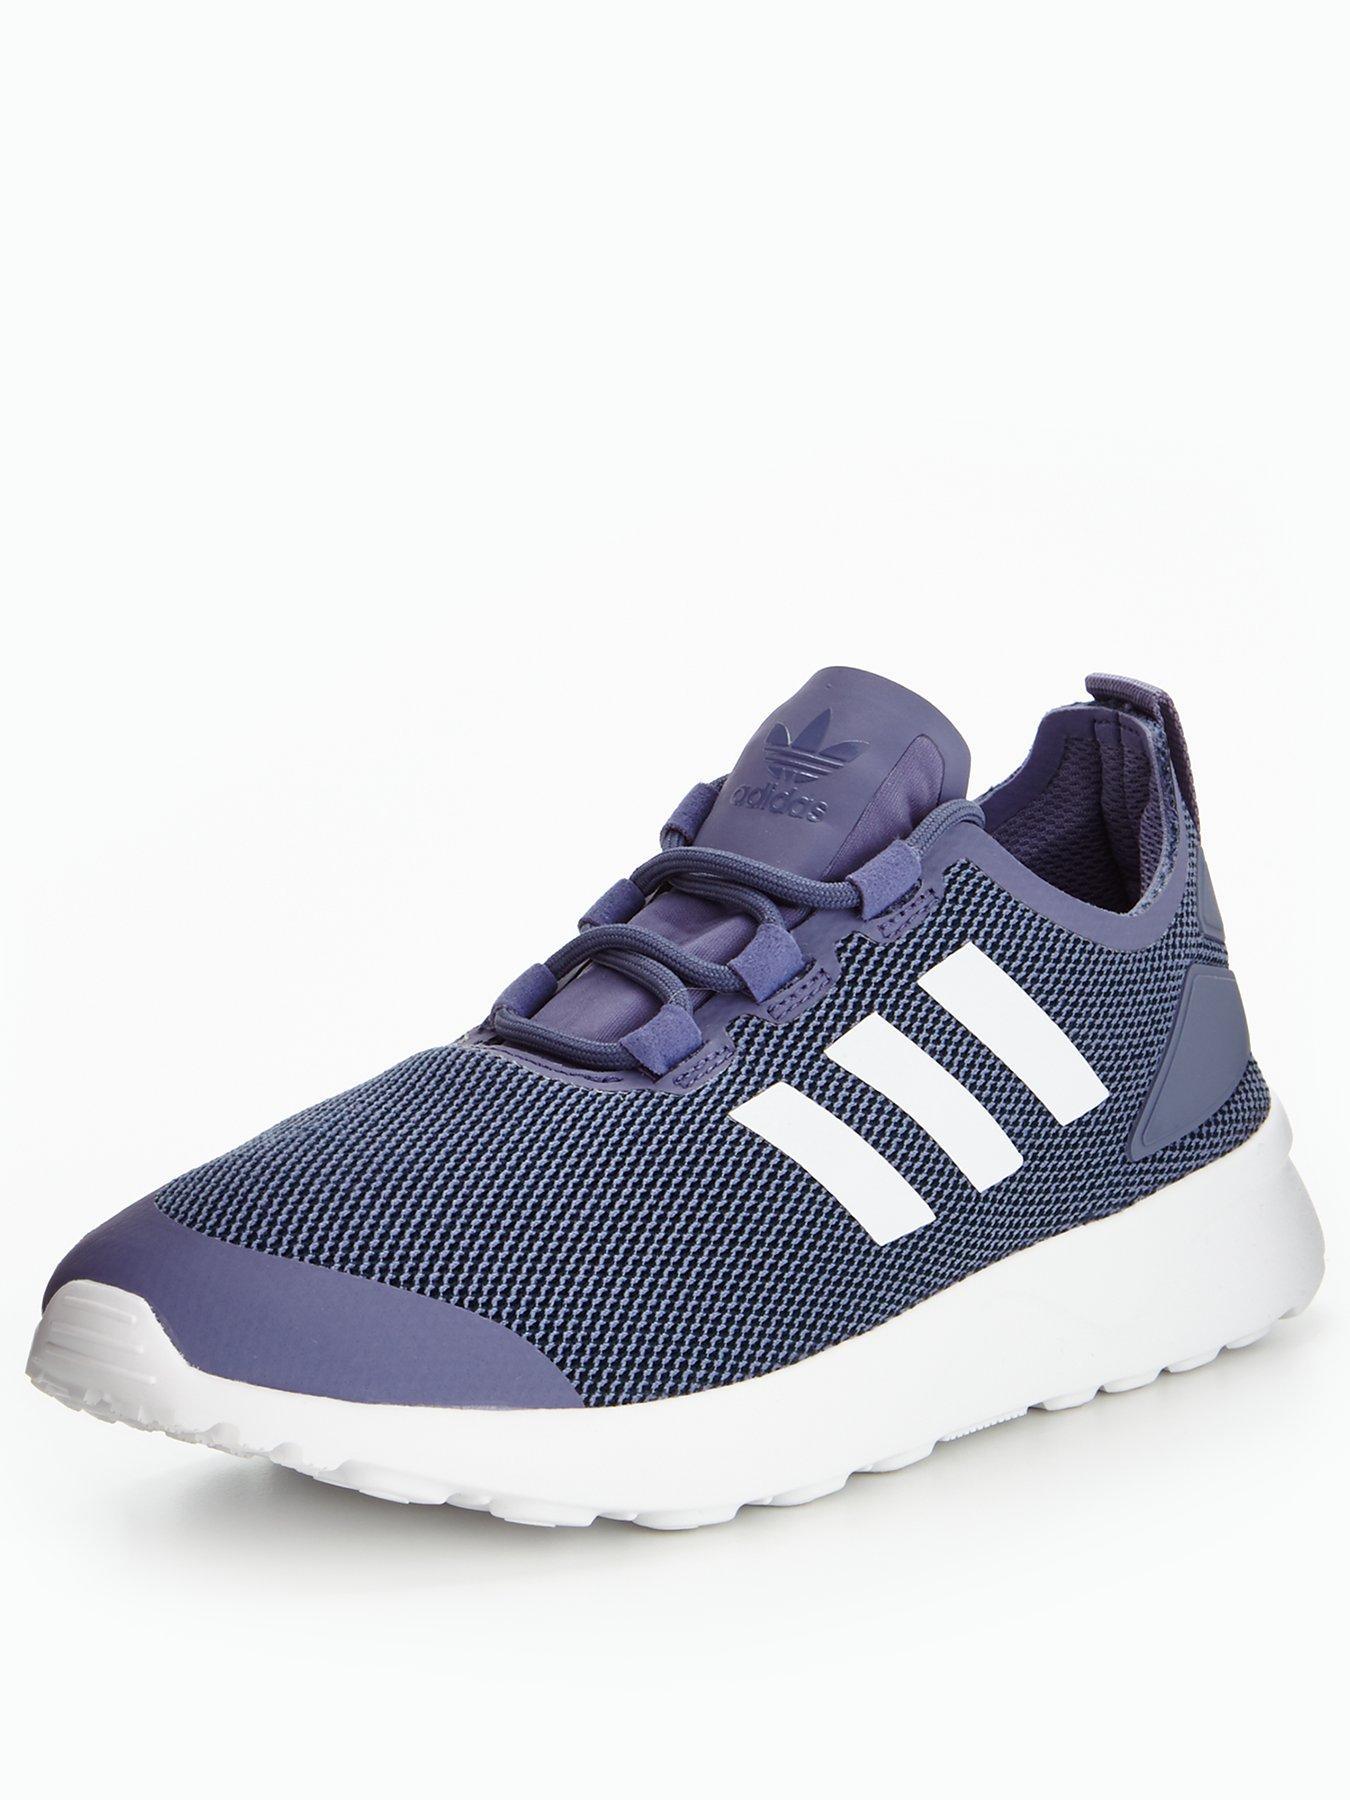 Adidas Originals Flux ZX Flux Originals ADV Verve   littlewoods  513ae6